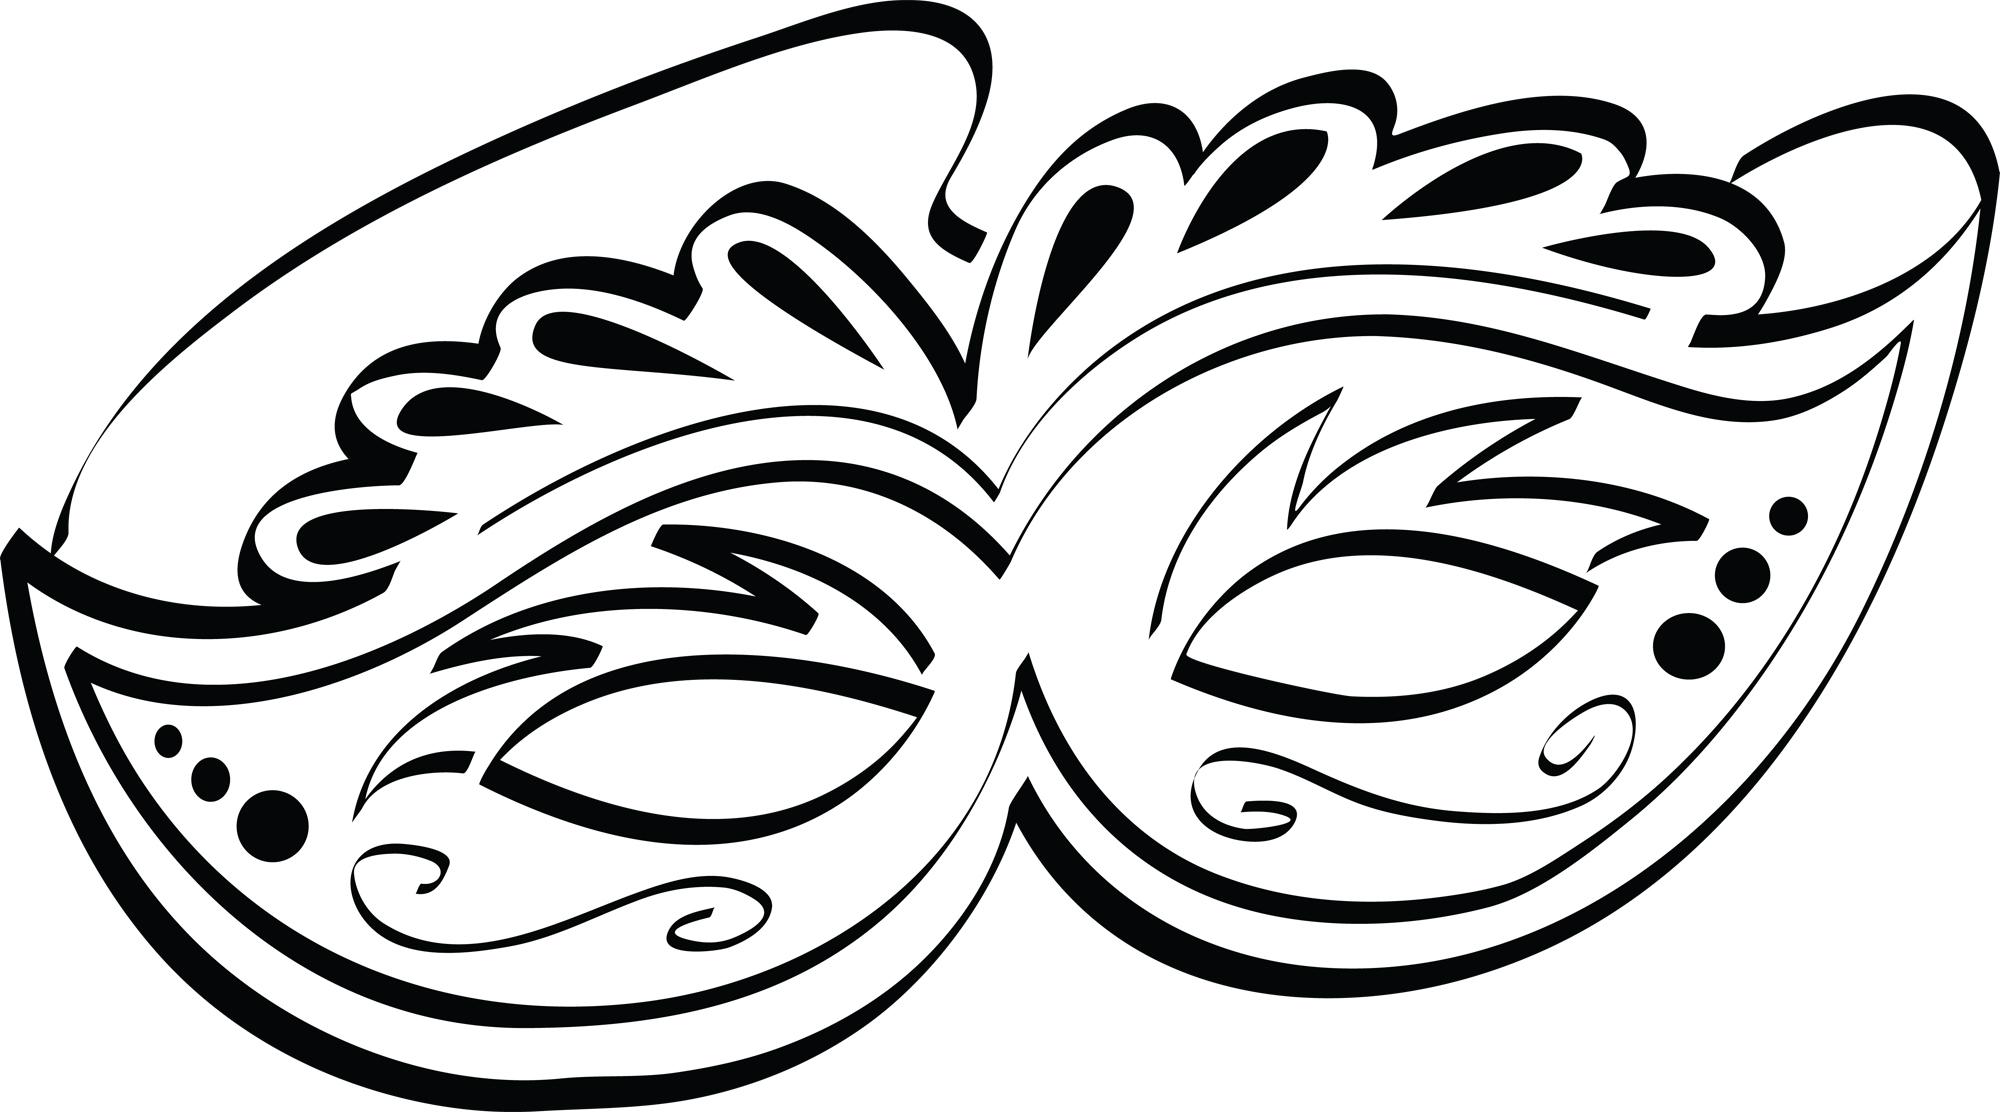 mardi gras mask clip art clipart panda free clipart images rh clipartpanda com mardi gras mask clipart free mardi gras mask clipart black and white